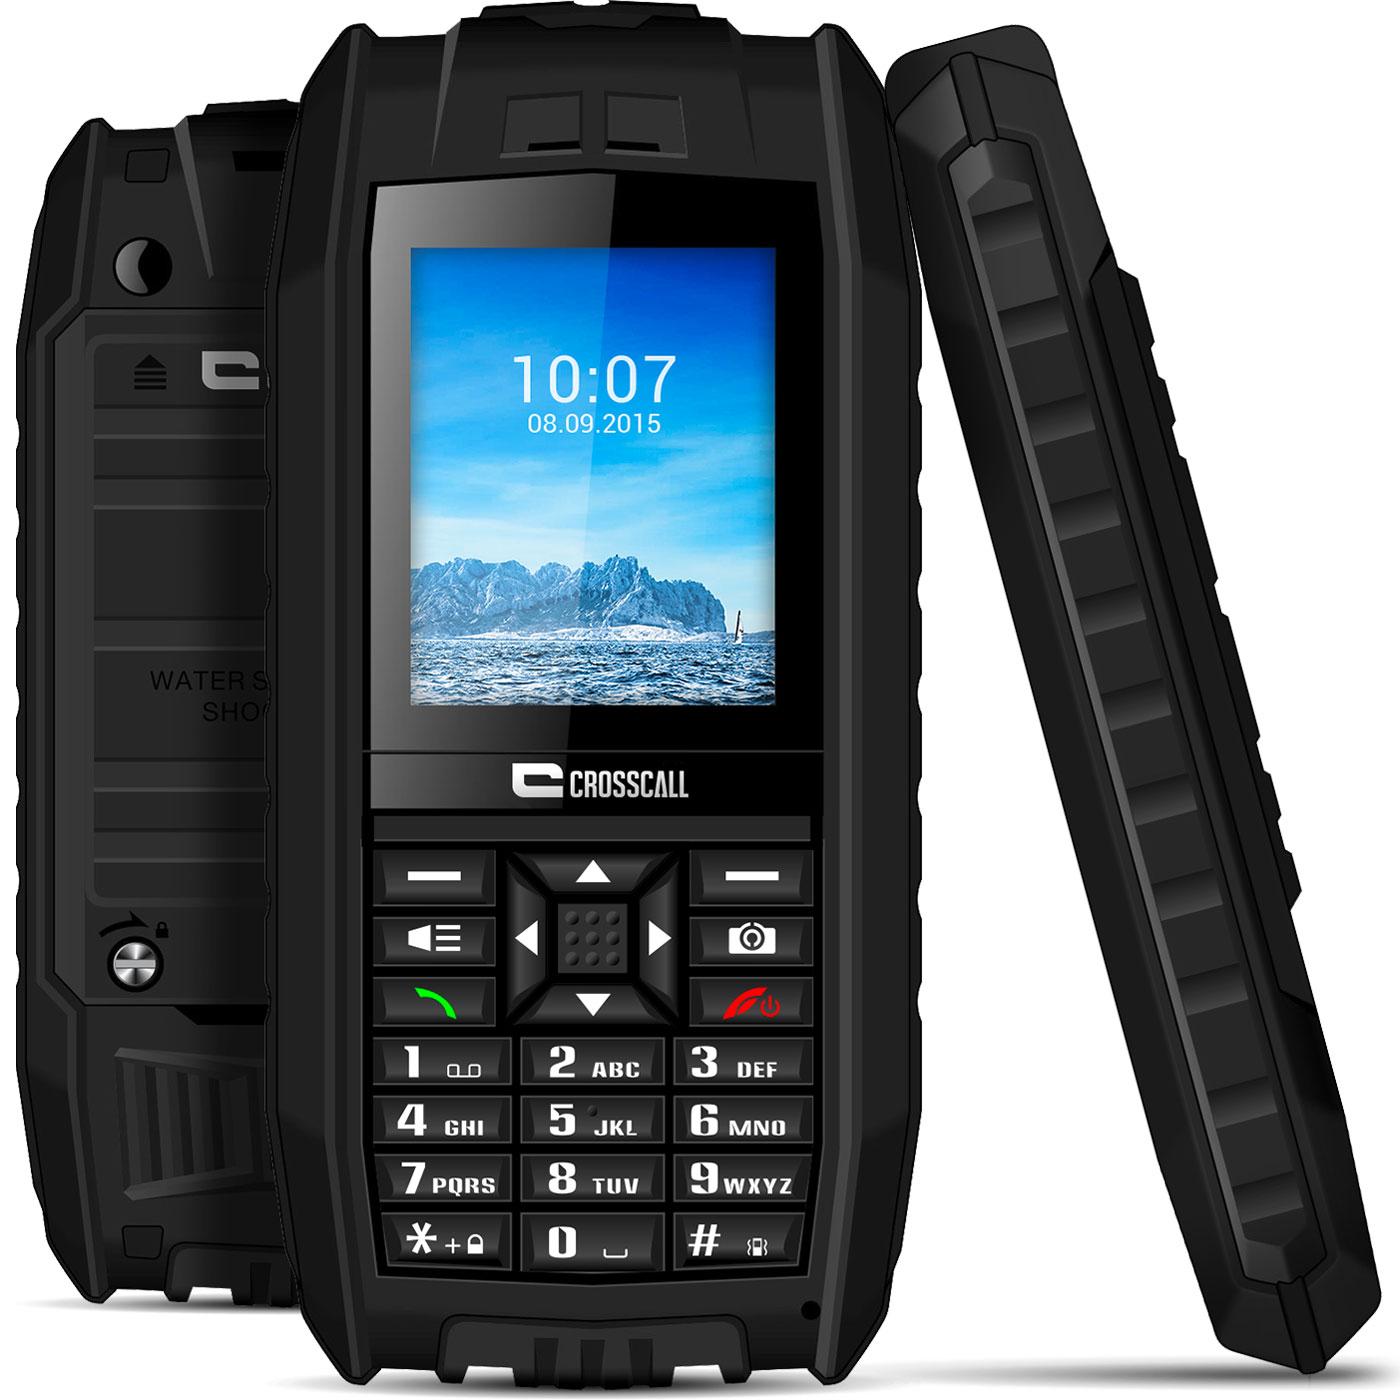 "Mobile & smartphone Crosscall Shark V2 Noir Téléphone 2G Dual SIM IP68 - Ecran 2.2"" - Bluetooth - 650 mAh"